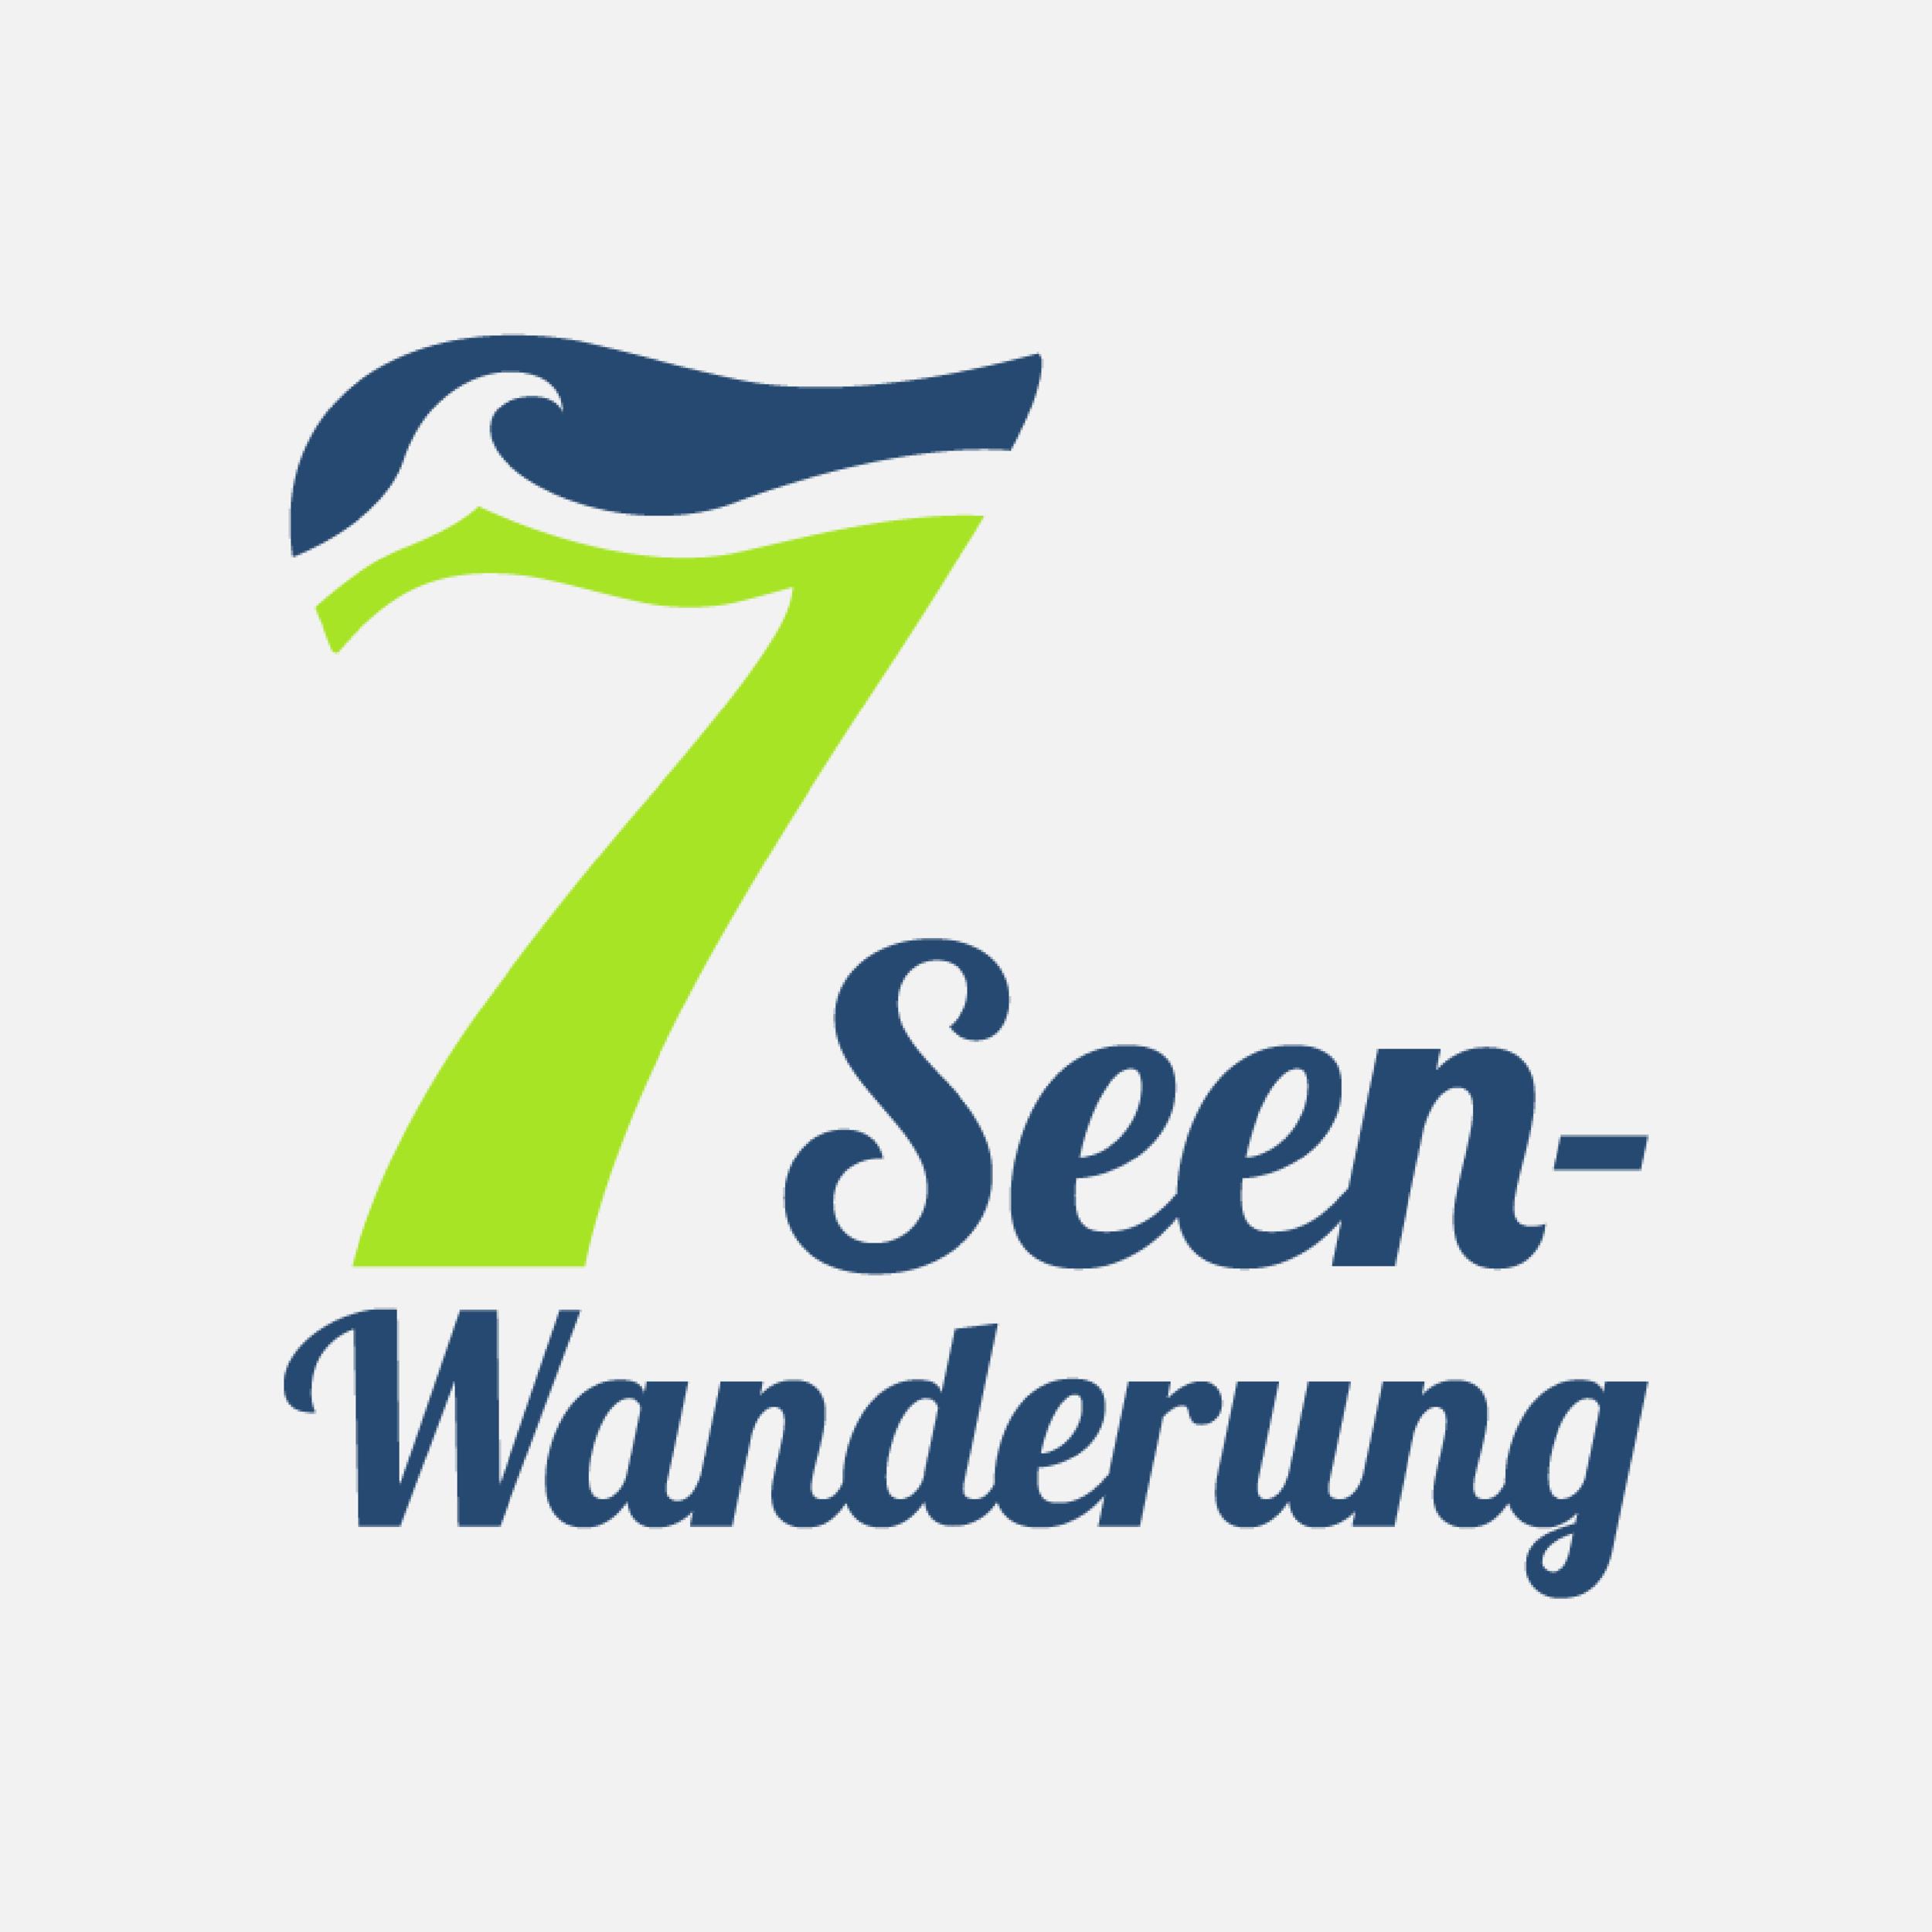 7 SEEN-WANDERUNG  DAS BESONERE WANDERERLEBNISS